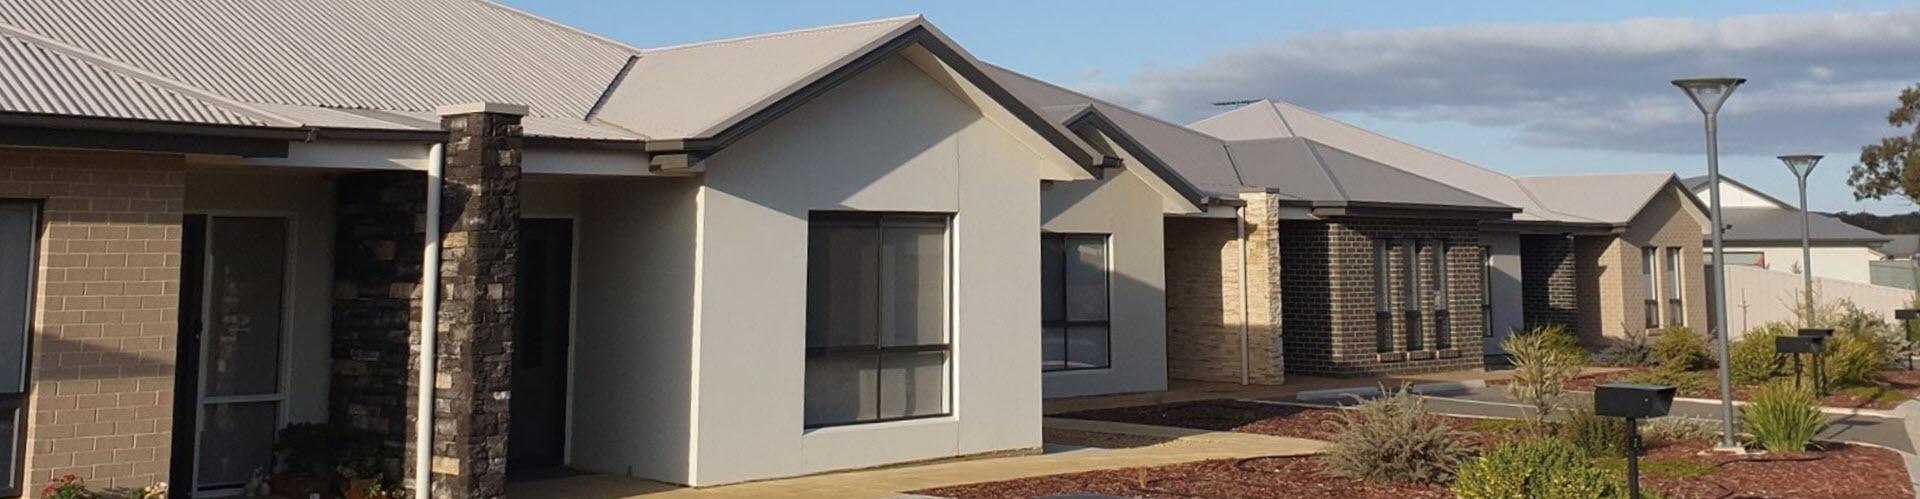 1-bedroom-unit-Supported-Accommodation-Barossa-Village-Nuriootpa-Tanunda-Angaston